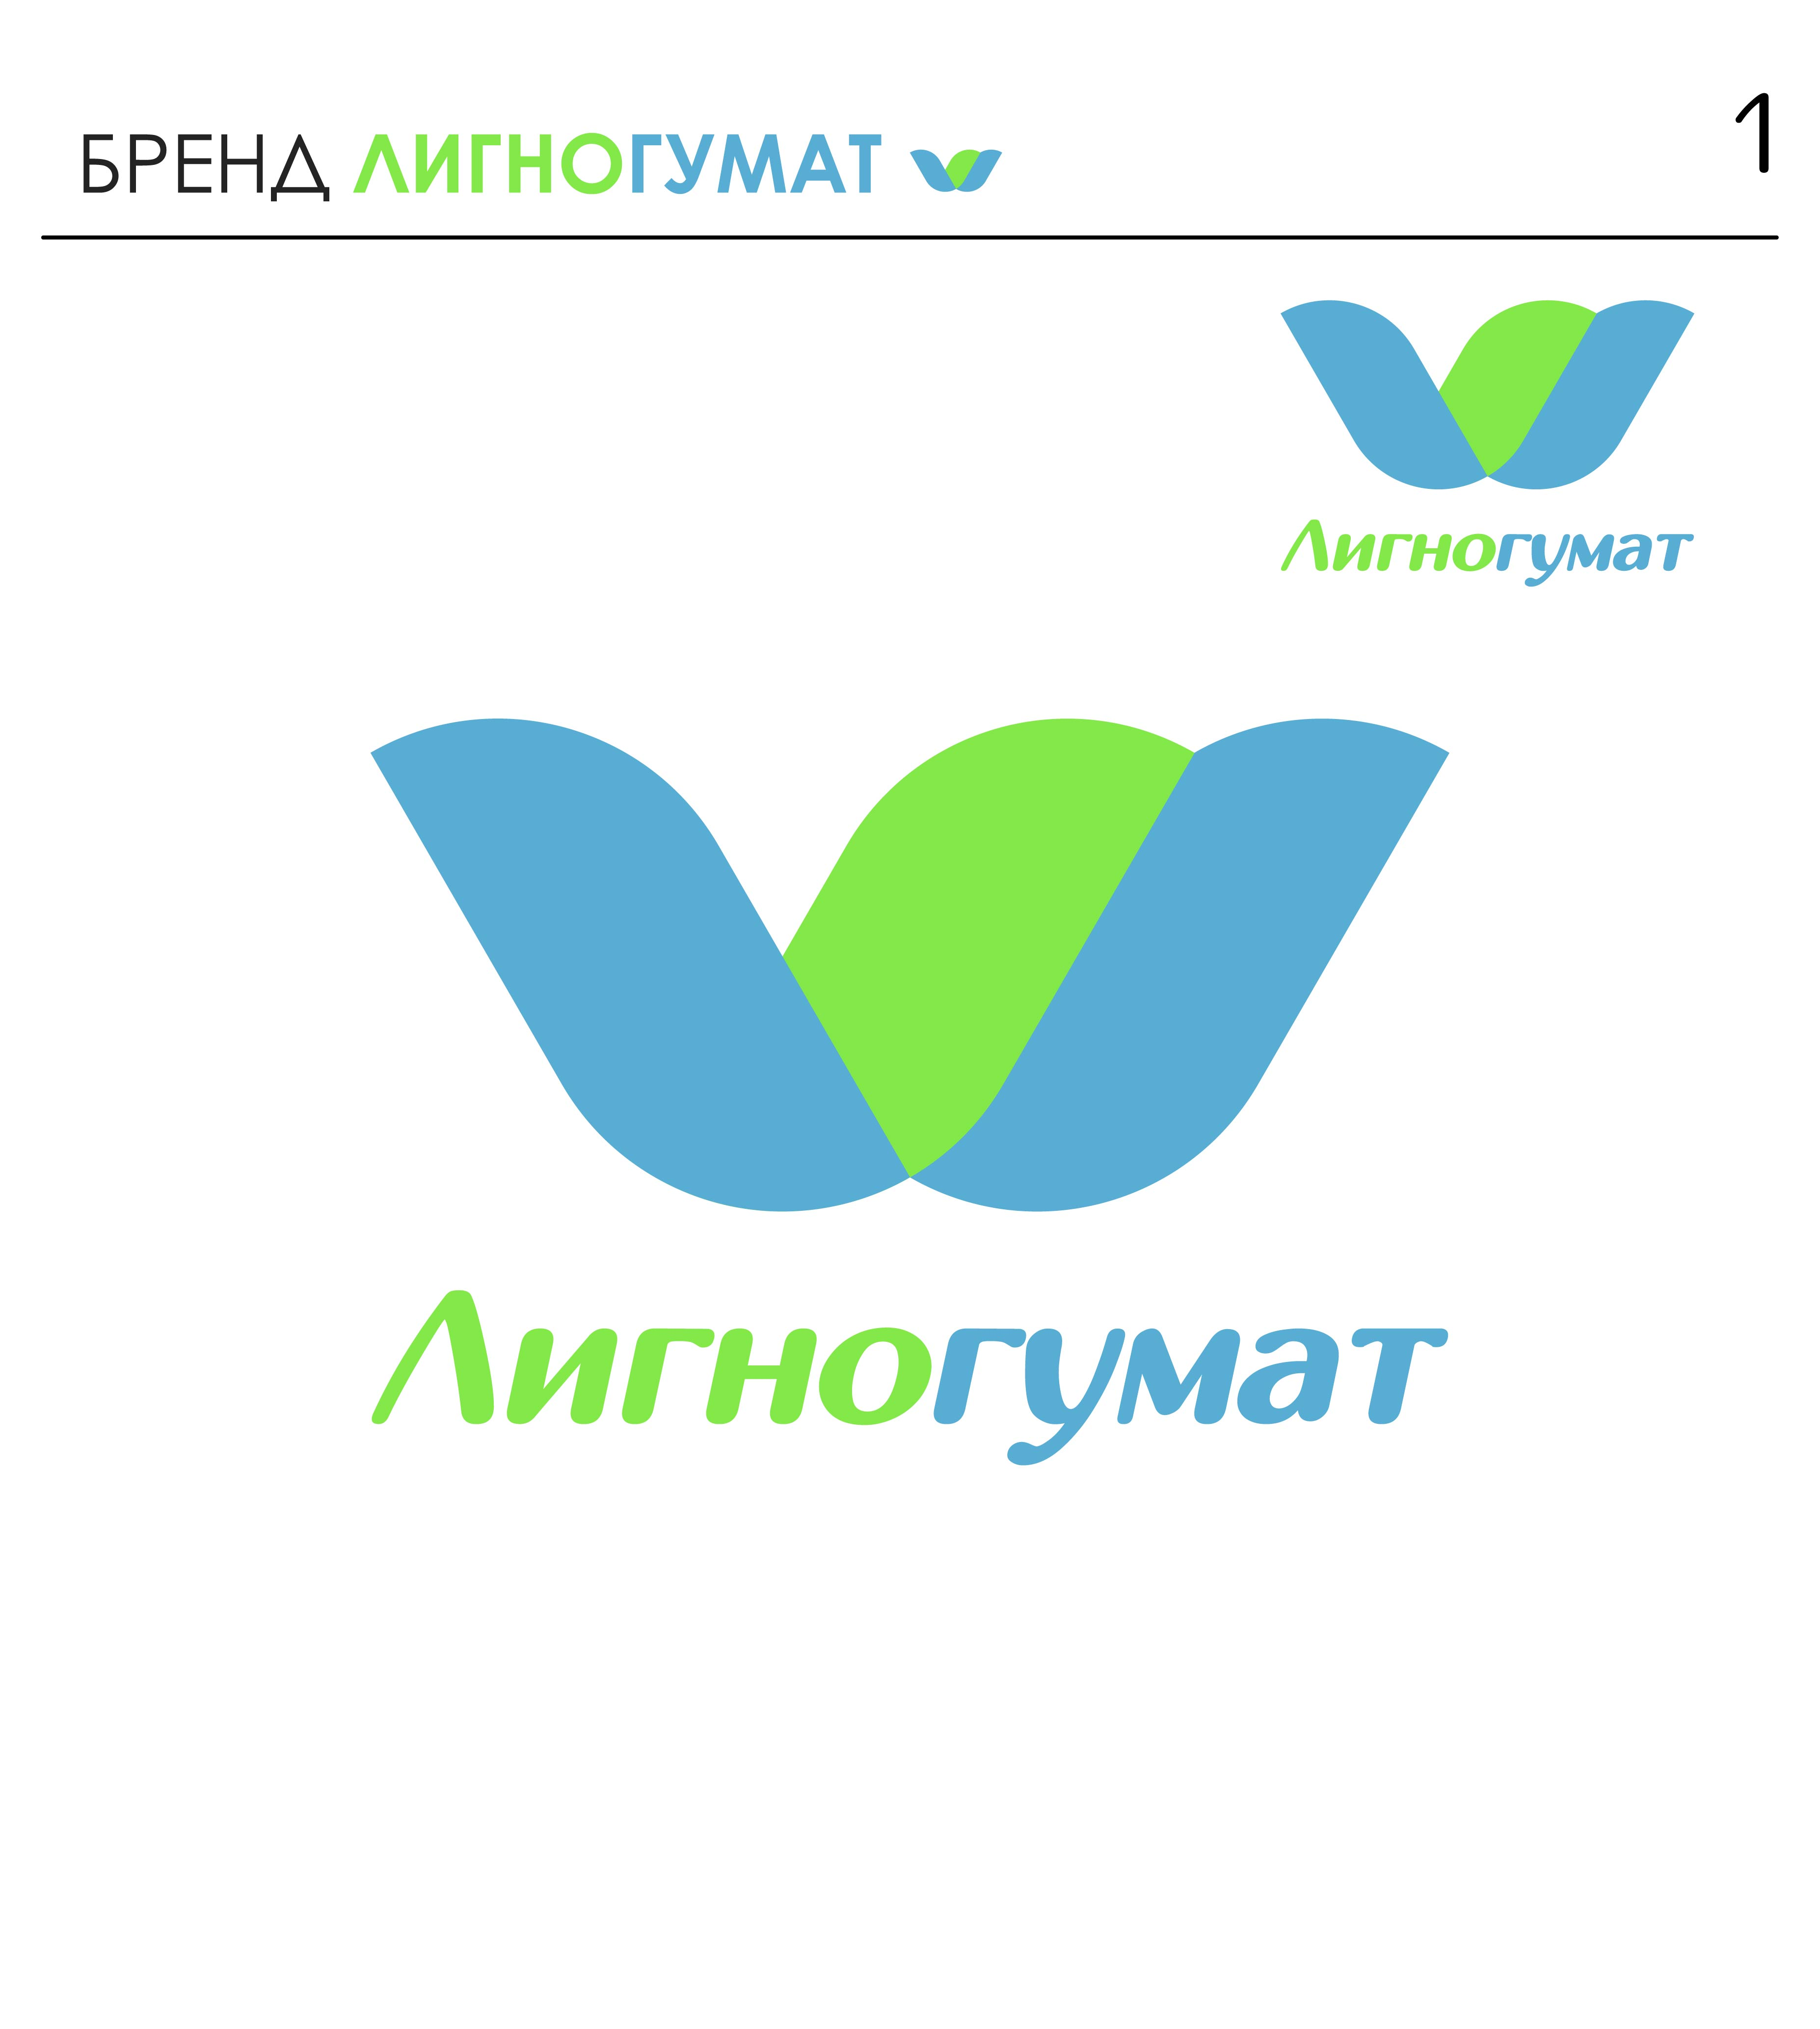 Логотип и фирменный стиль фото f_933595948962ff0f.jpg